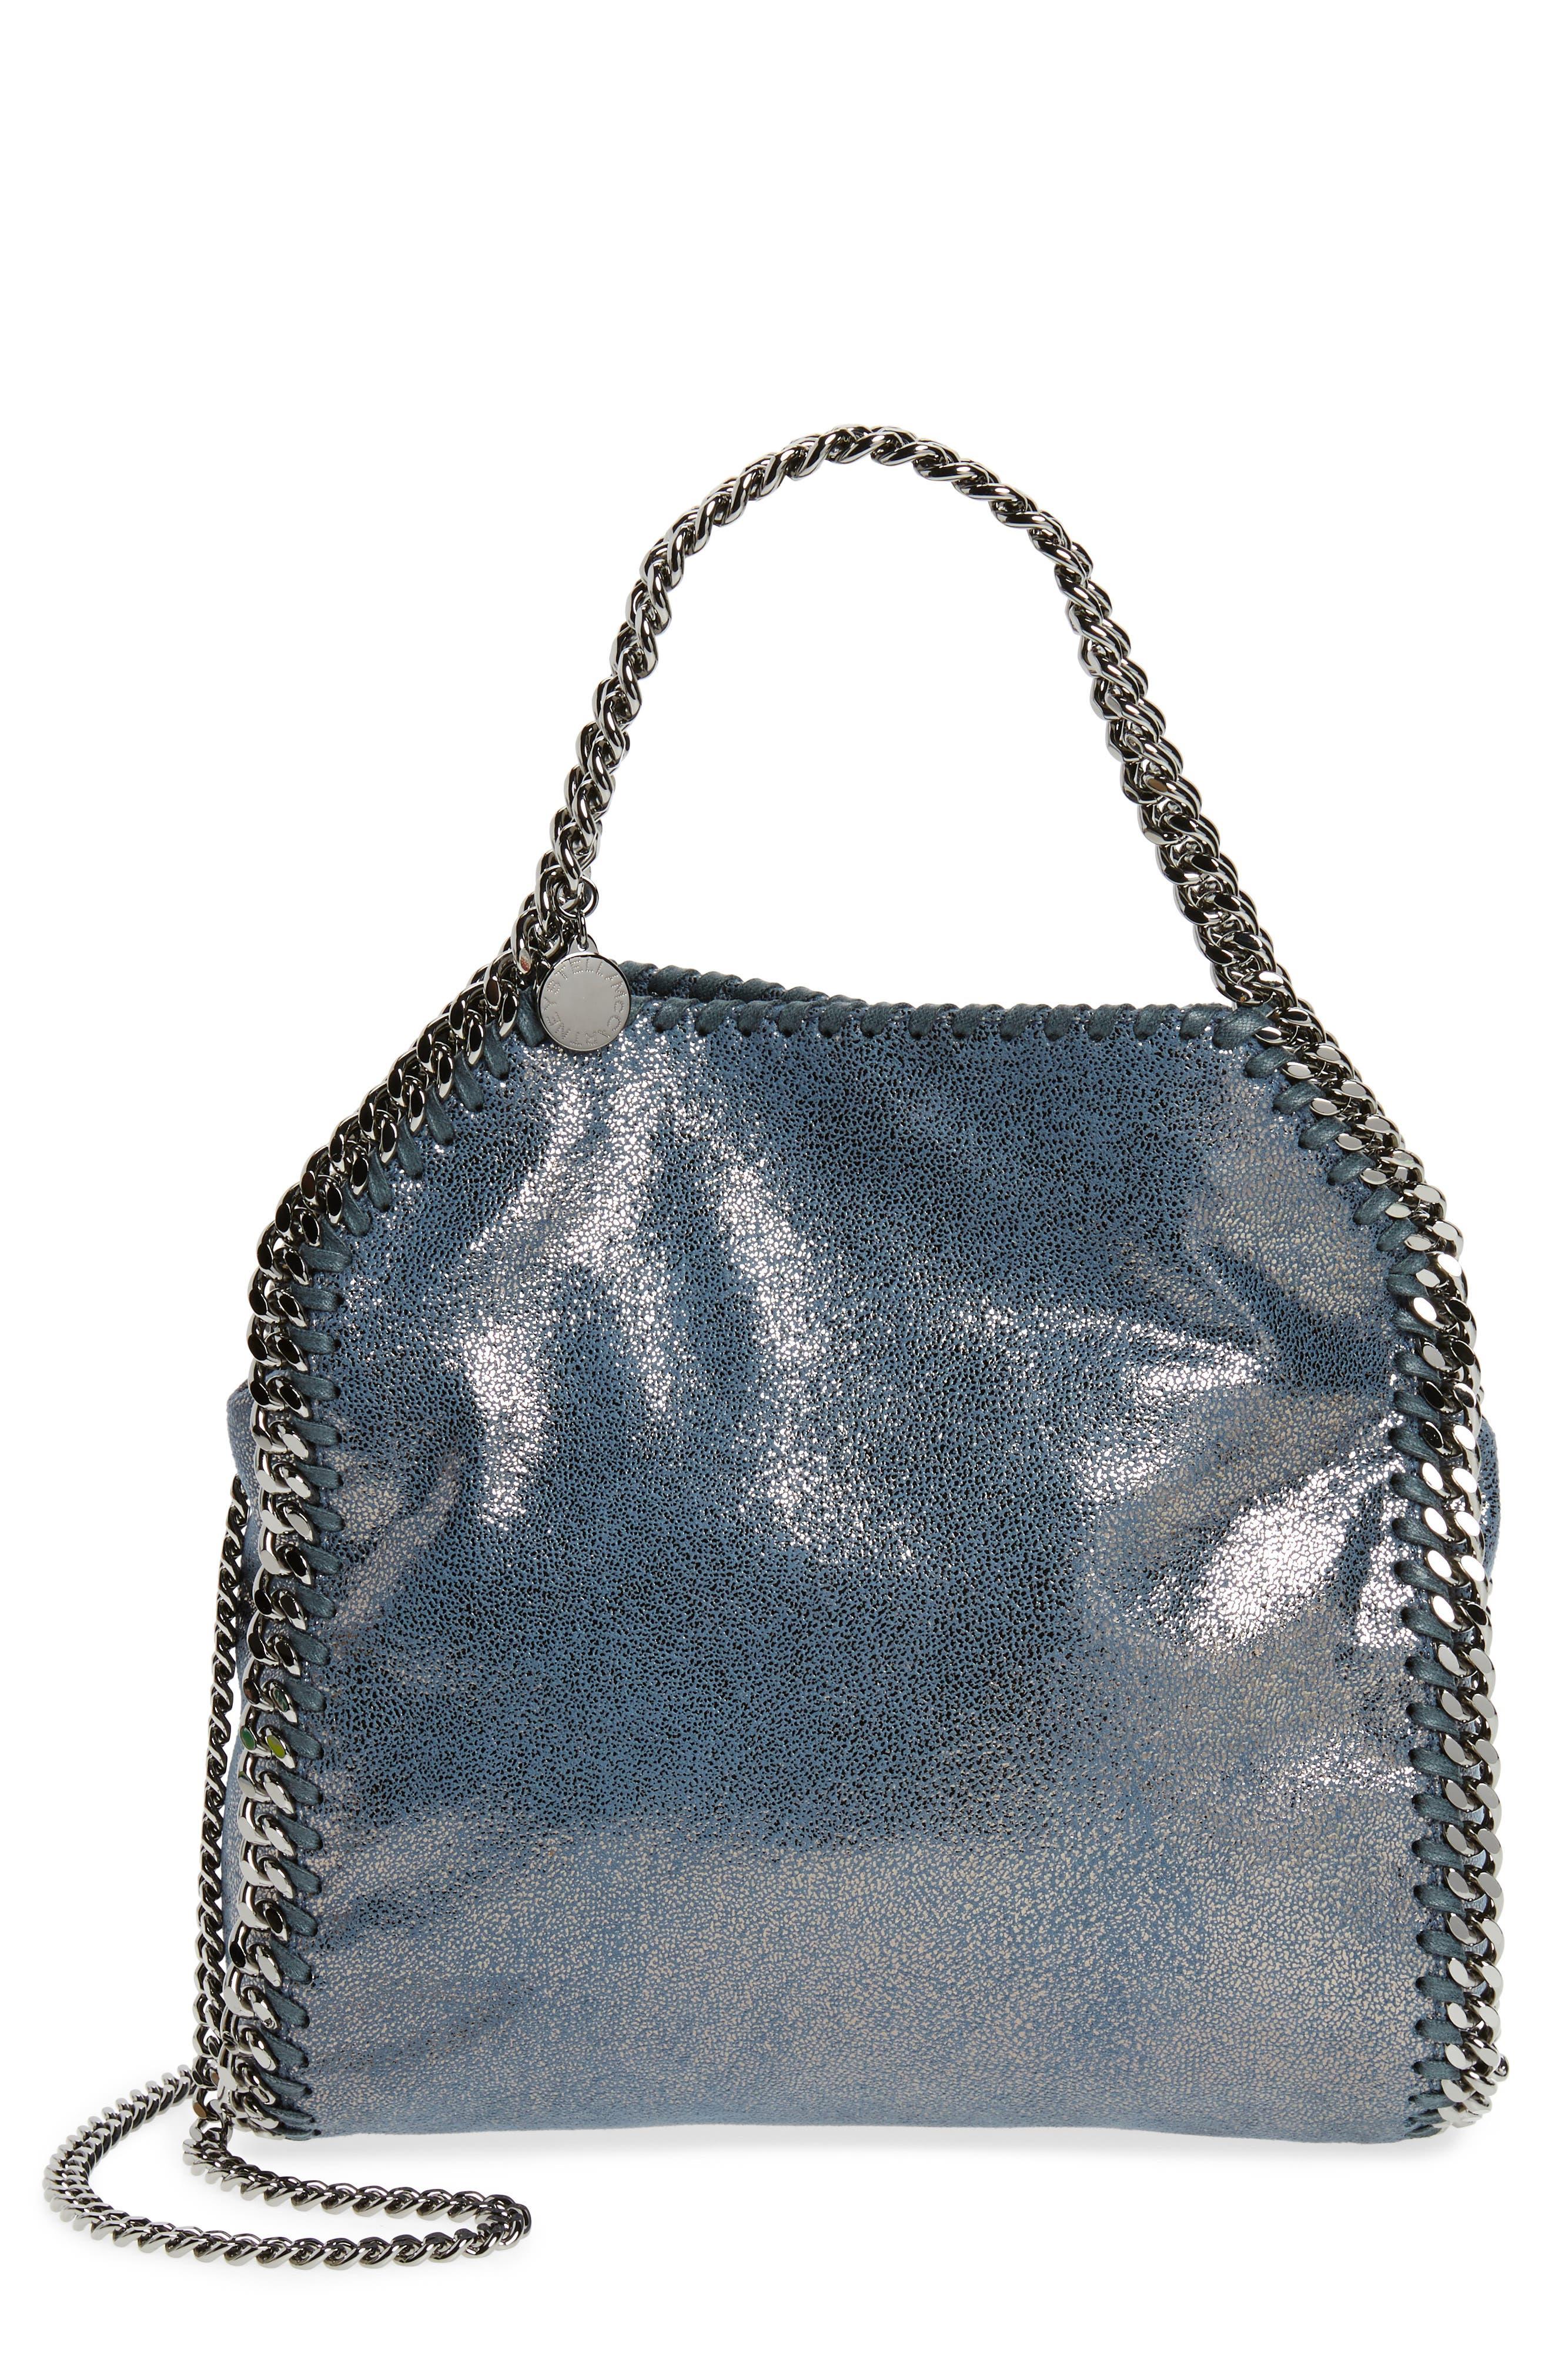 Main Image - Stella McCartney Mini Falabella Shaggy Deer Metallic Faux Leather Tote